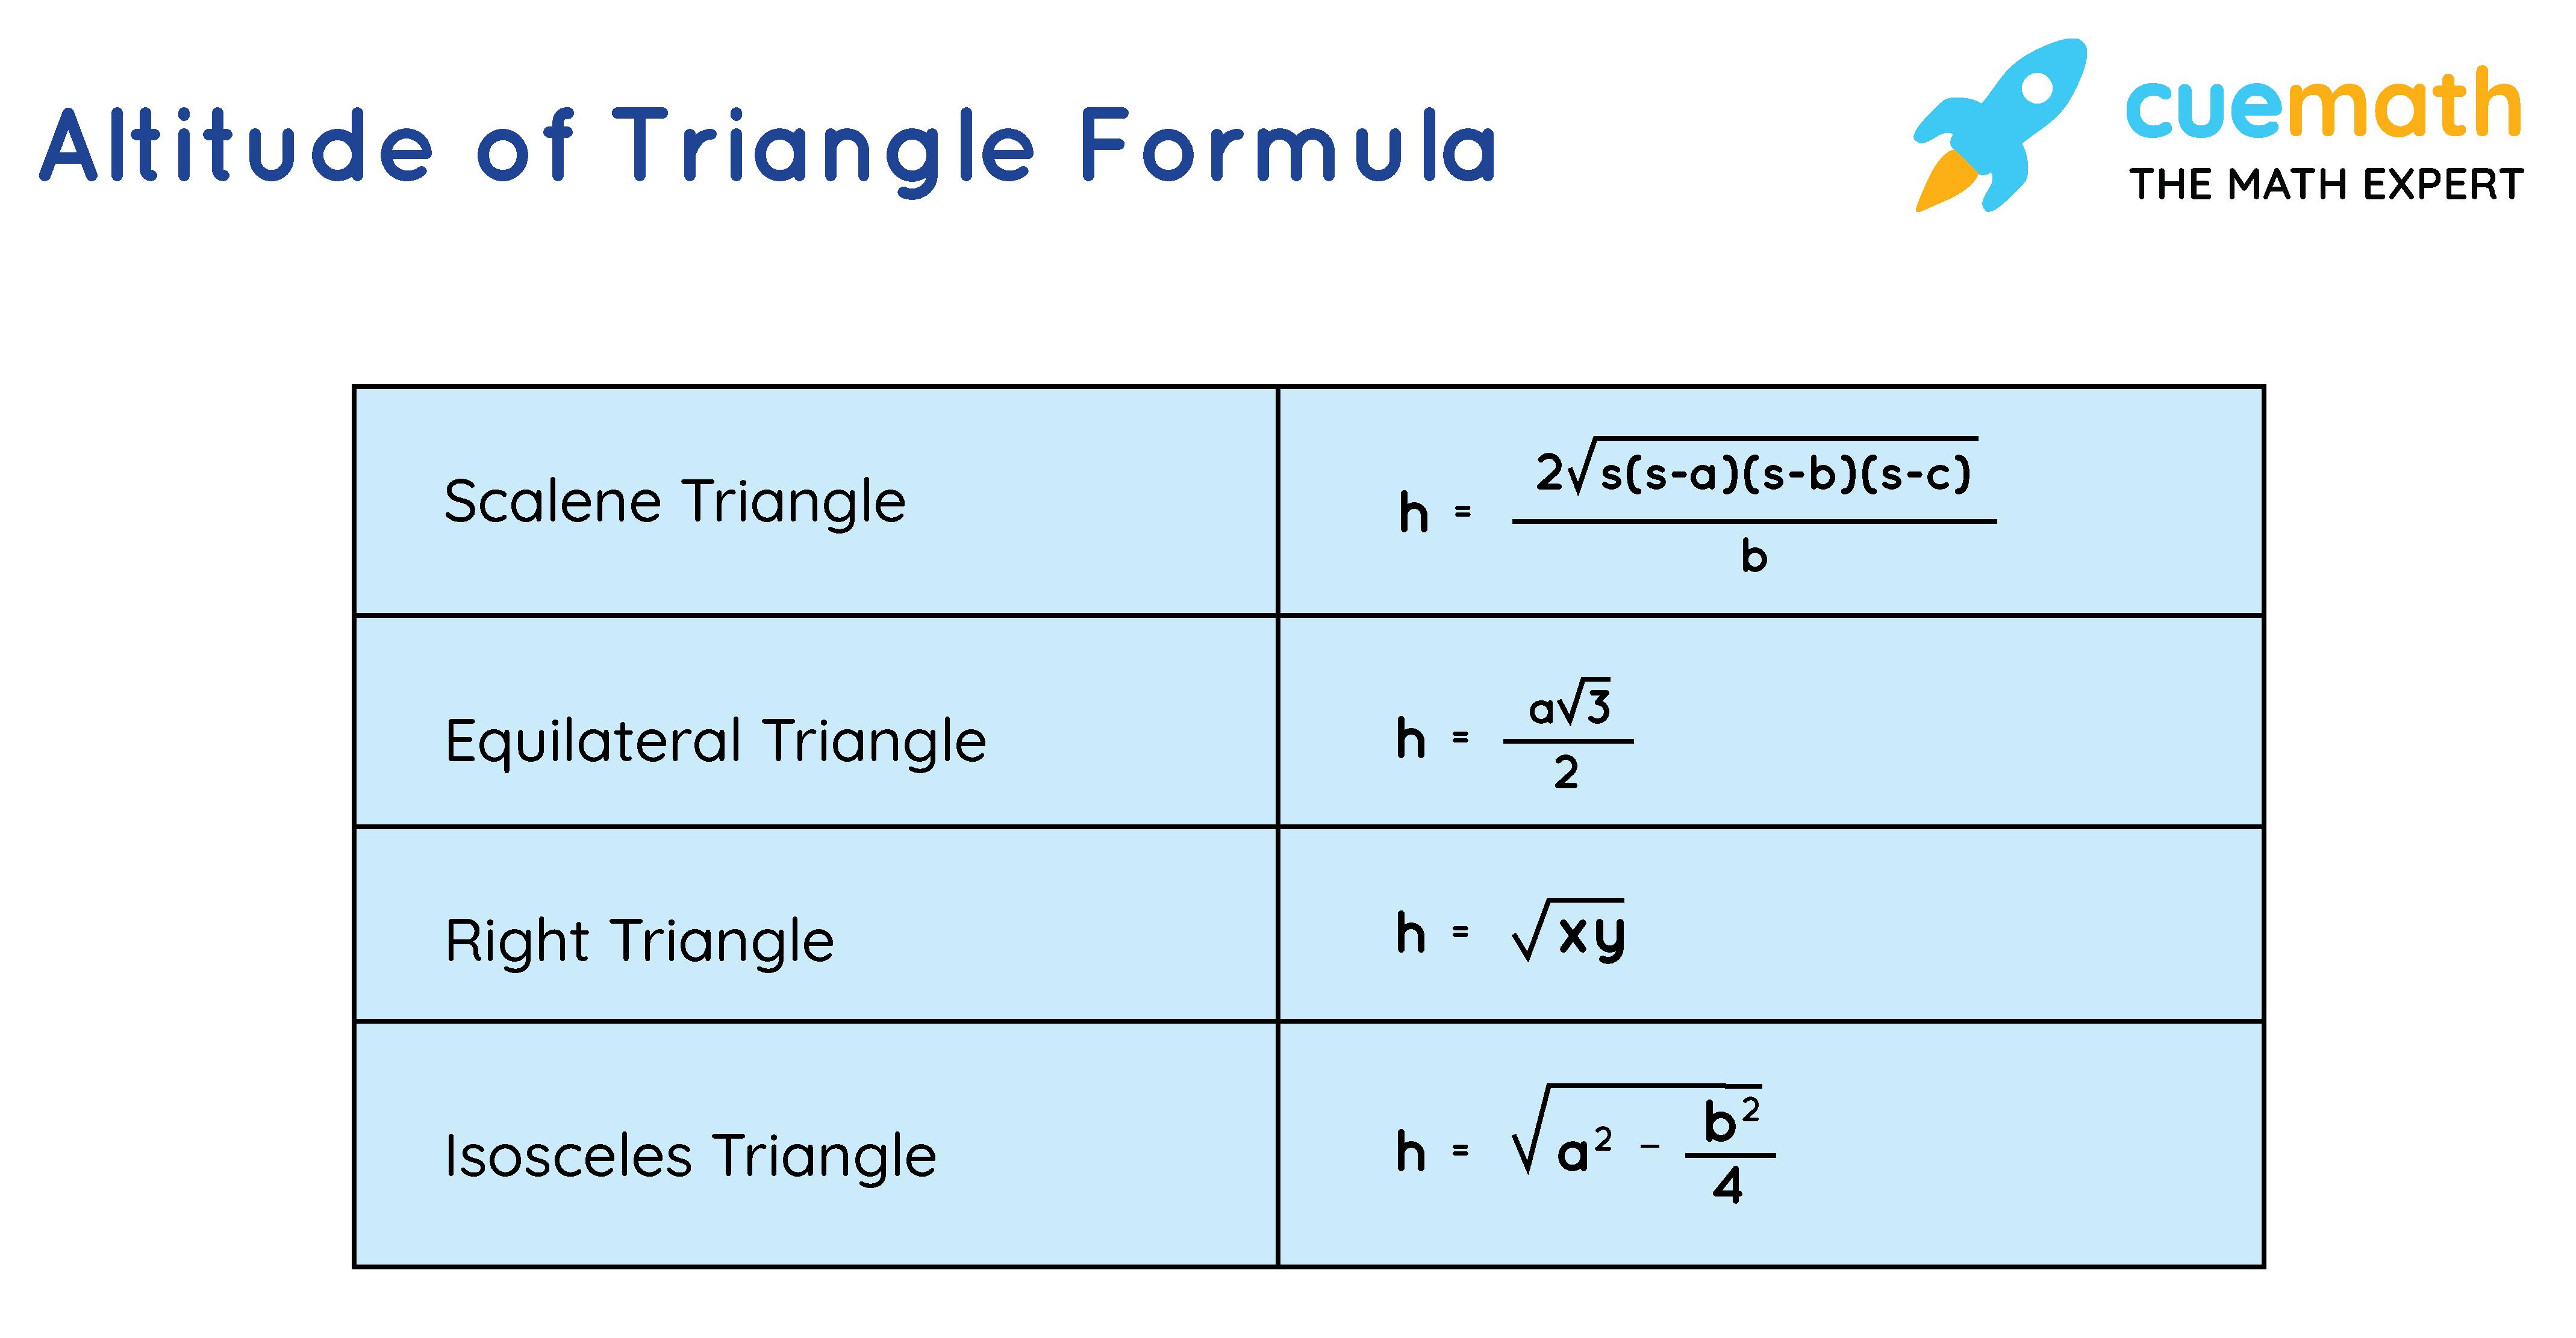 Altitude of triangle formulas